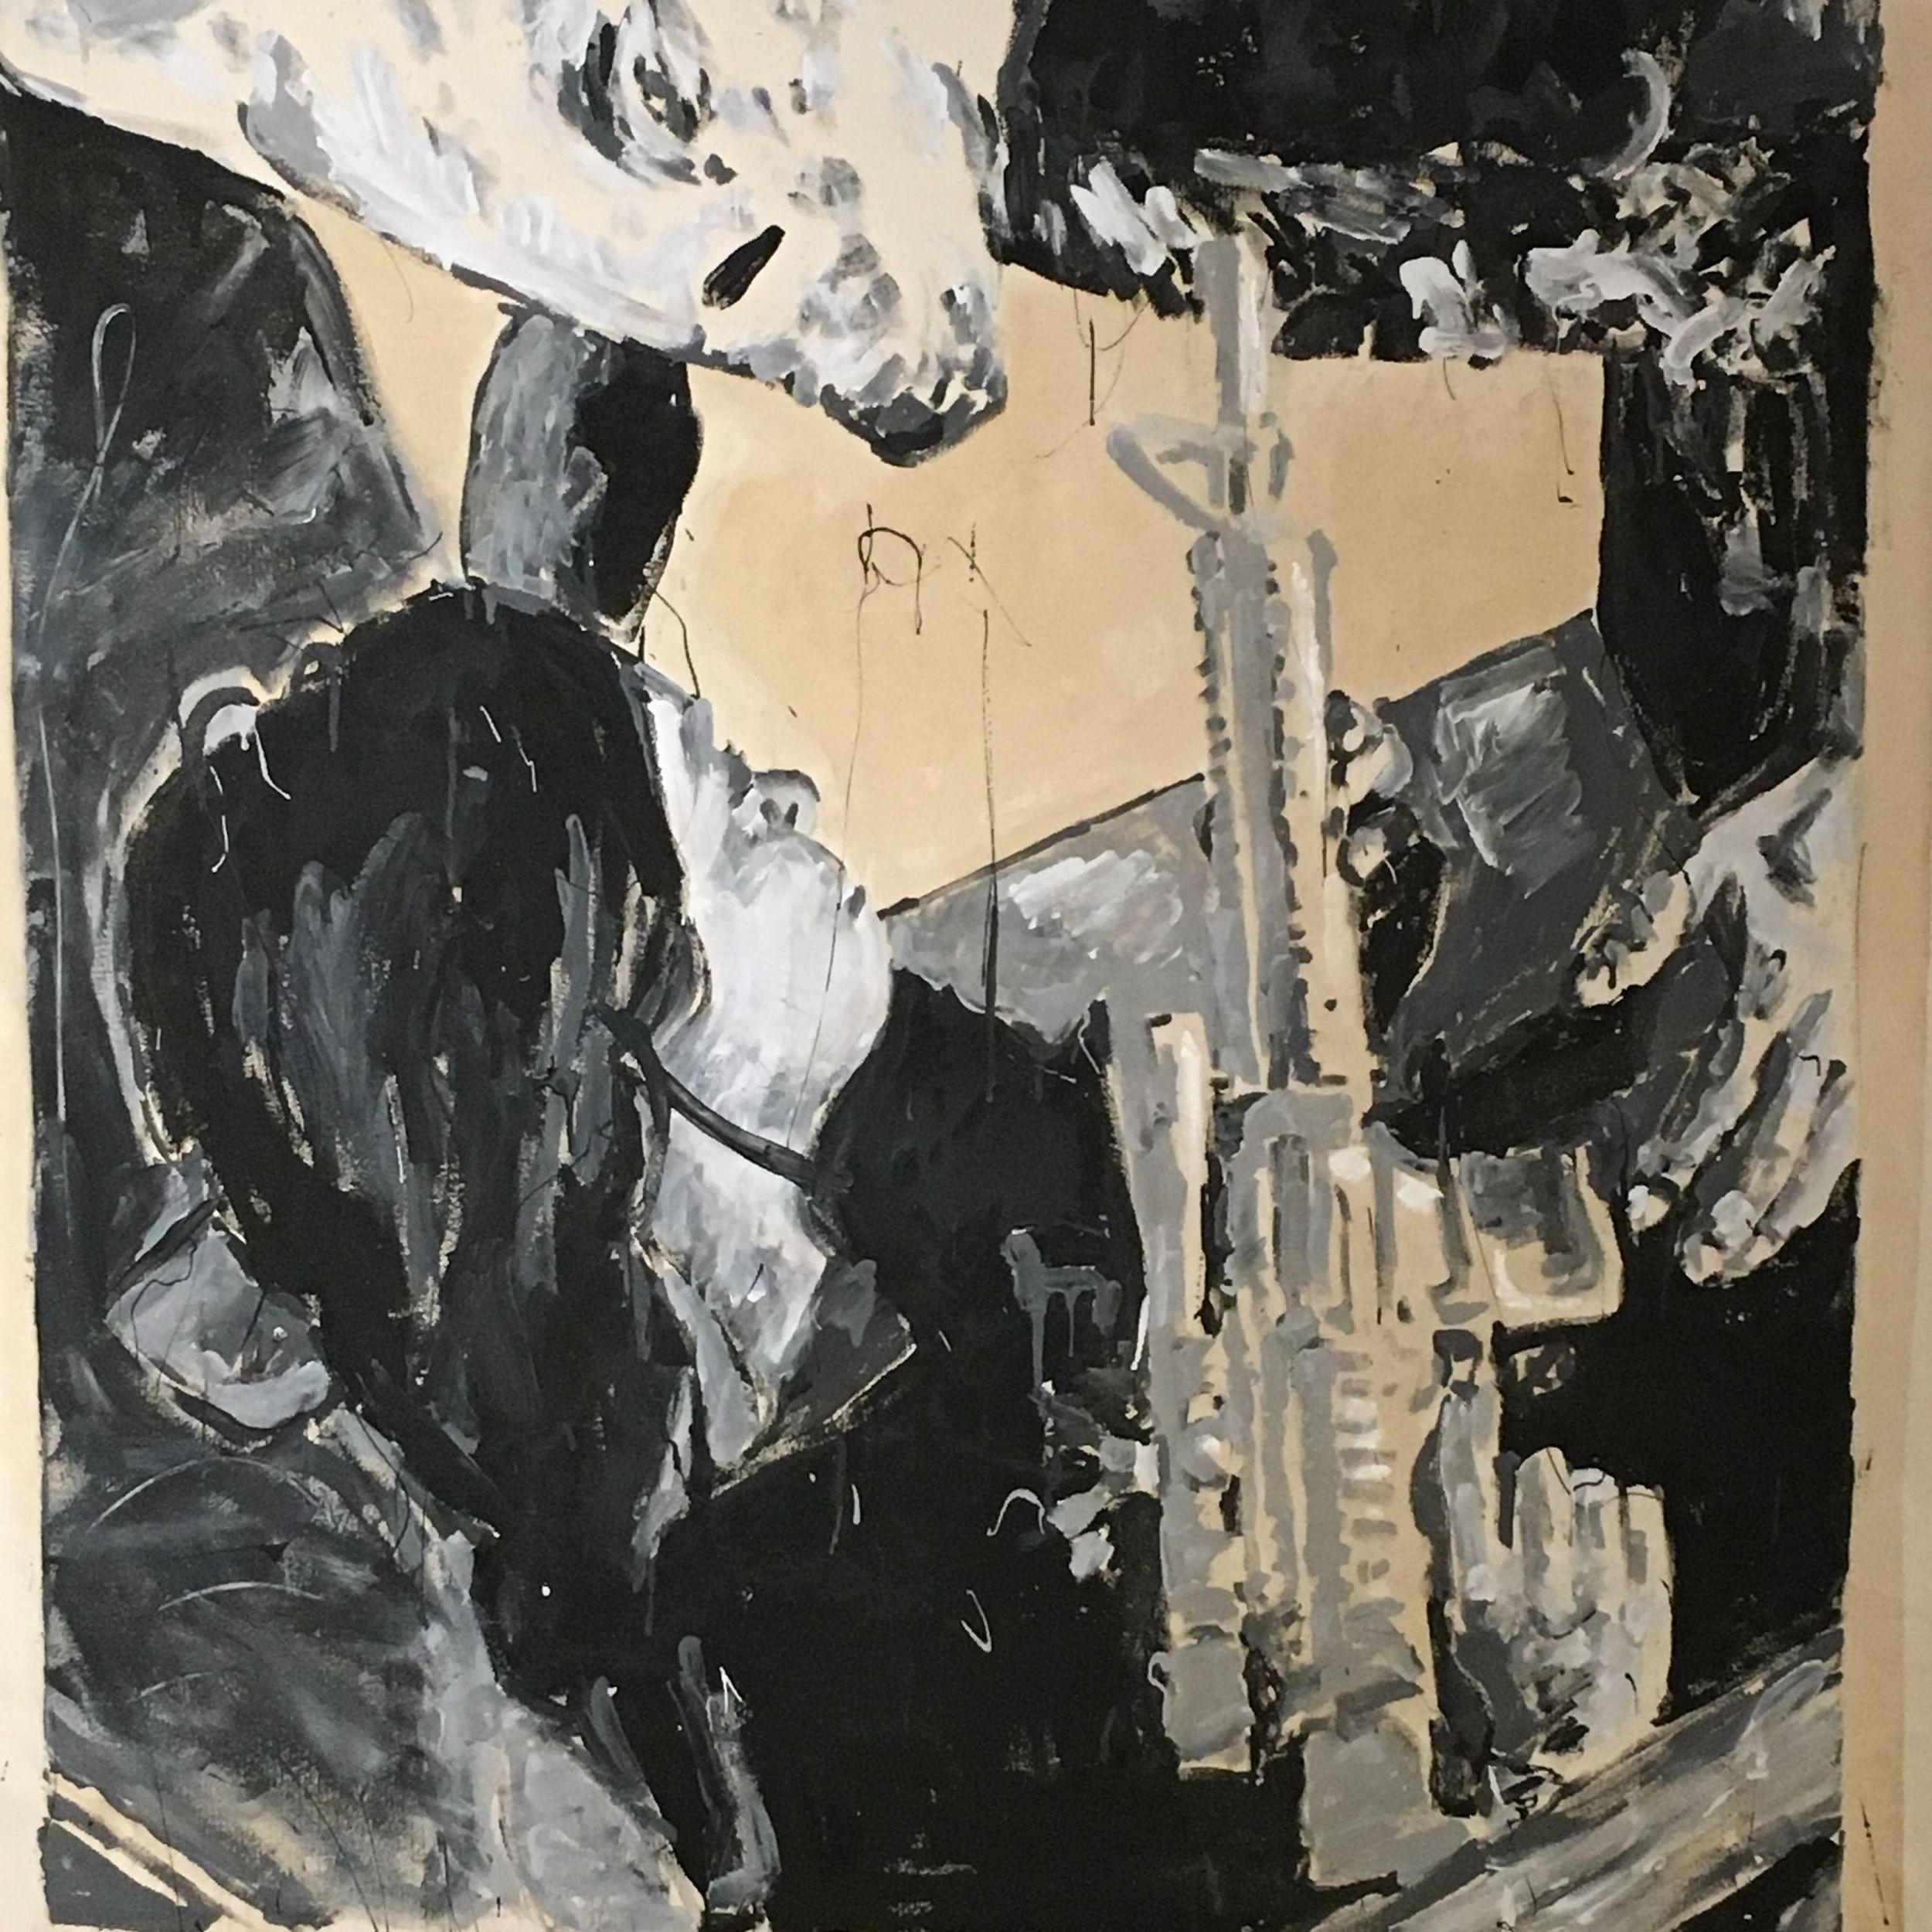 Adam Turl, Saint George of Peoria  acrylic and coffee on canvas (Kick the Cat)